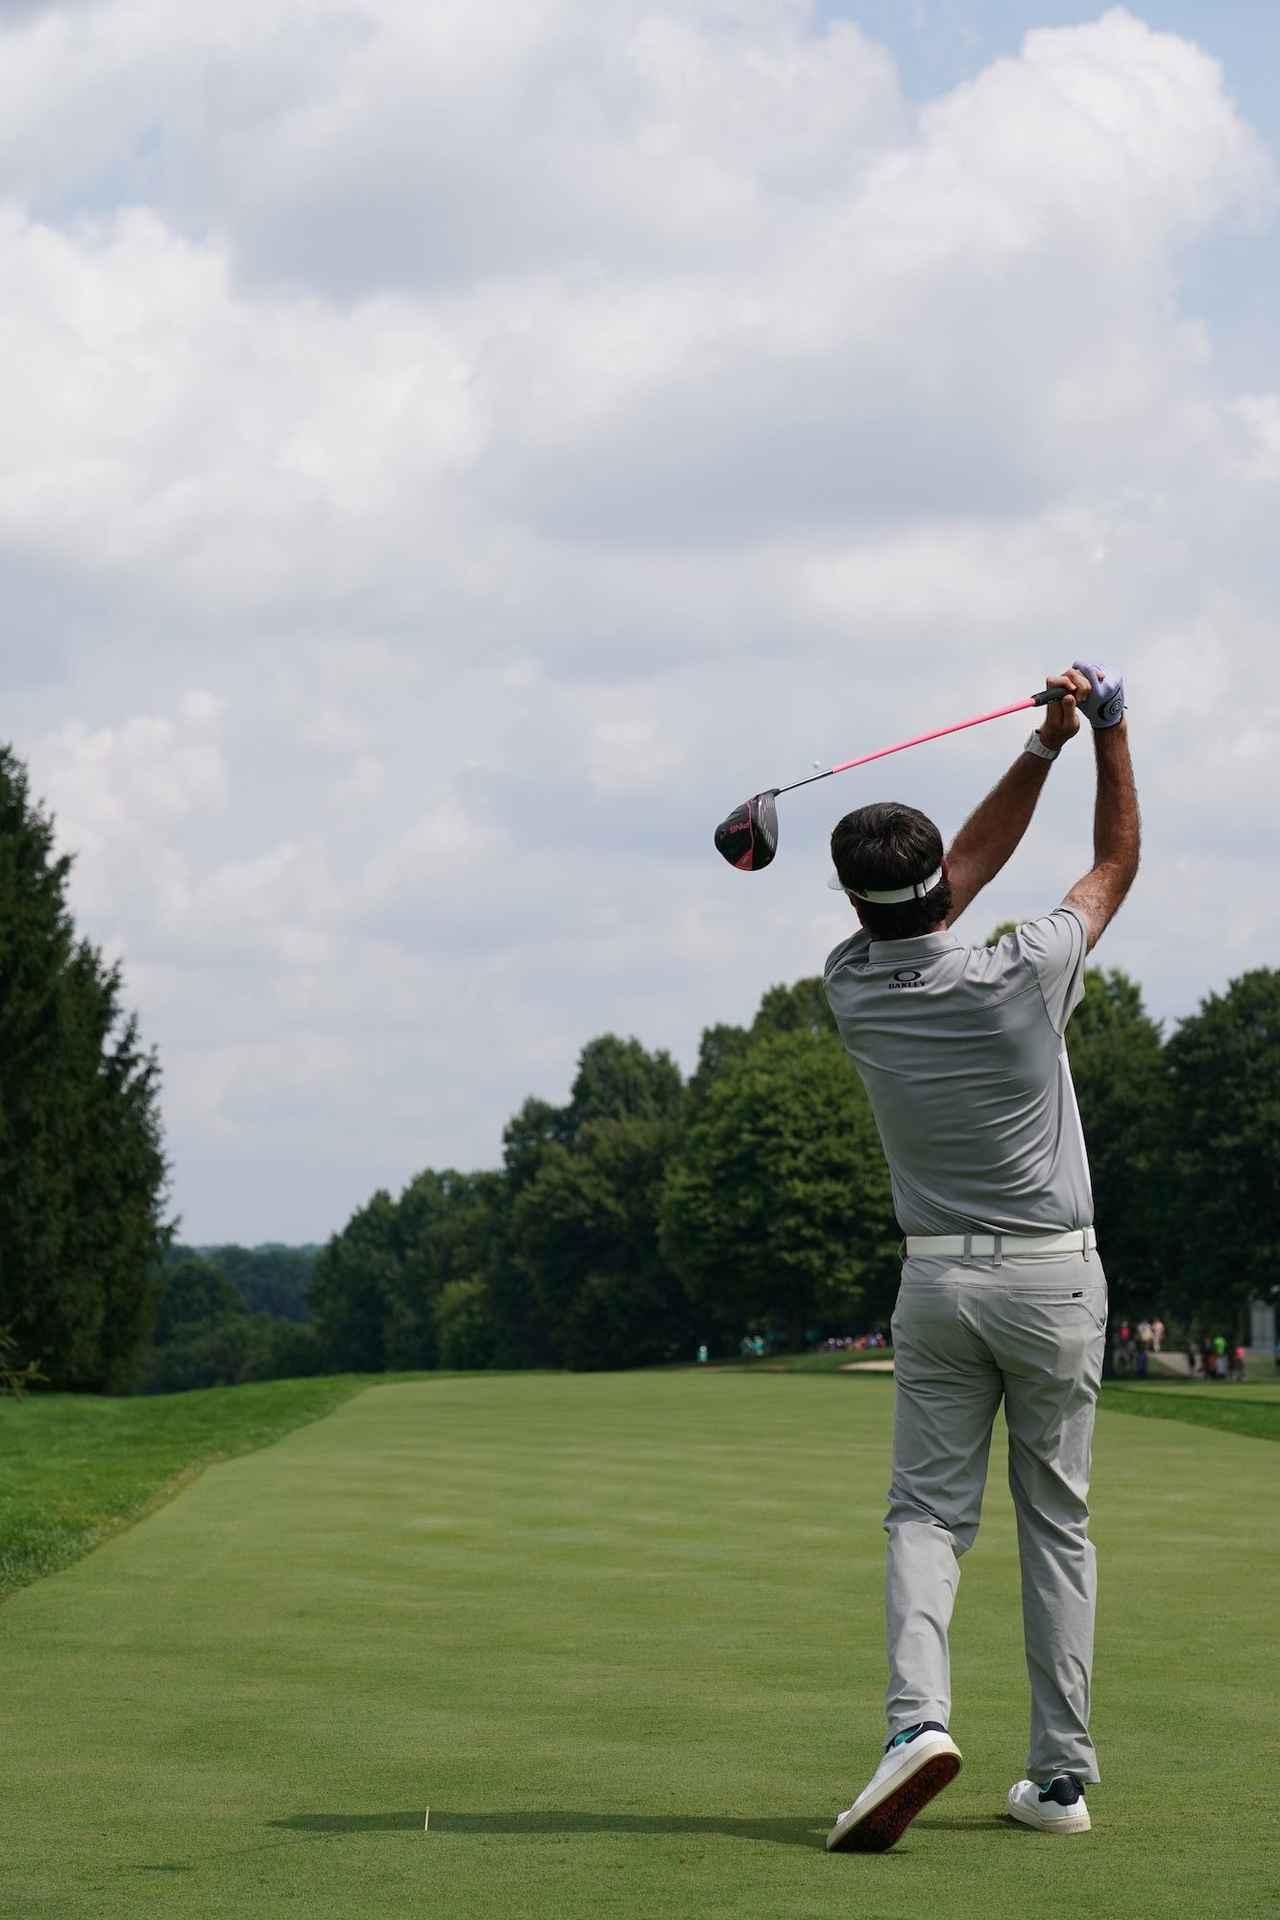 Images : 22番目の画像 - 強烈! バッバ・ワトソンのドライバーショット - みんなのゴルフダイジェスト